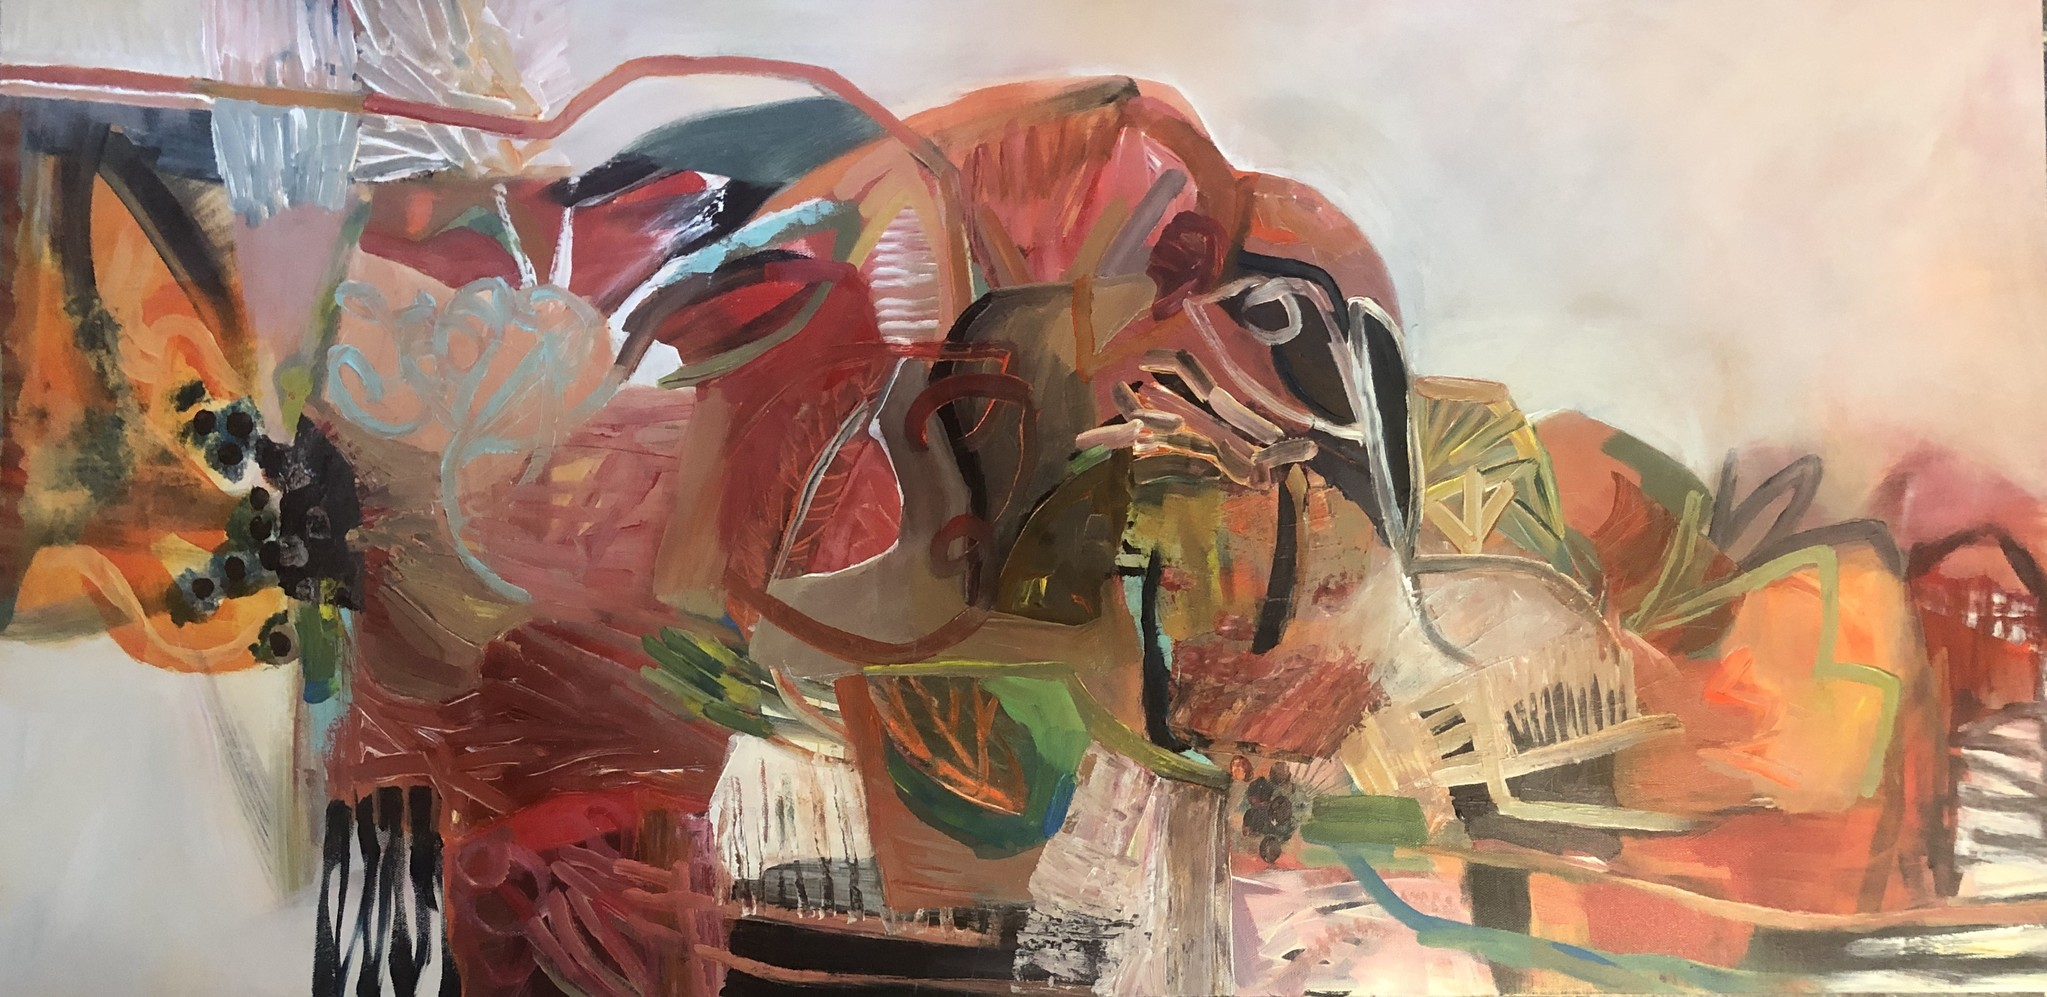 Bacchanalia by Sarah Van Beckum